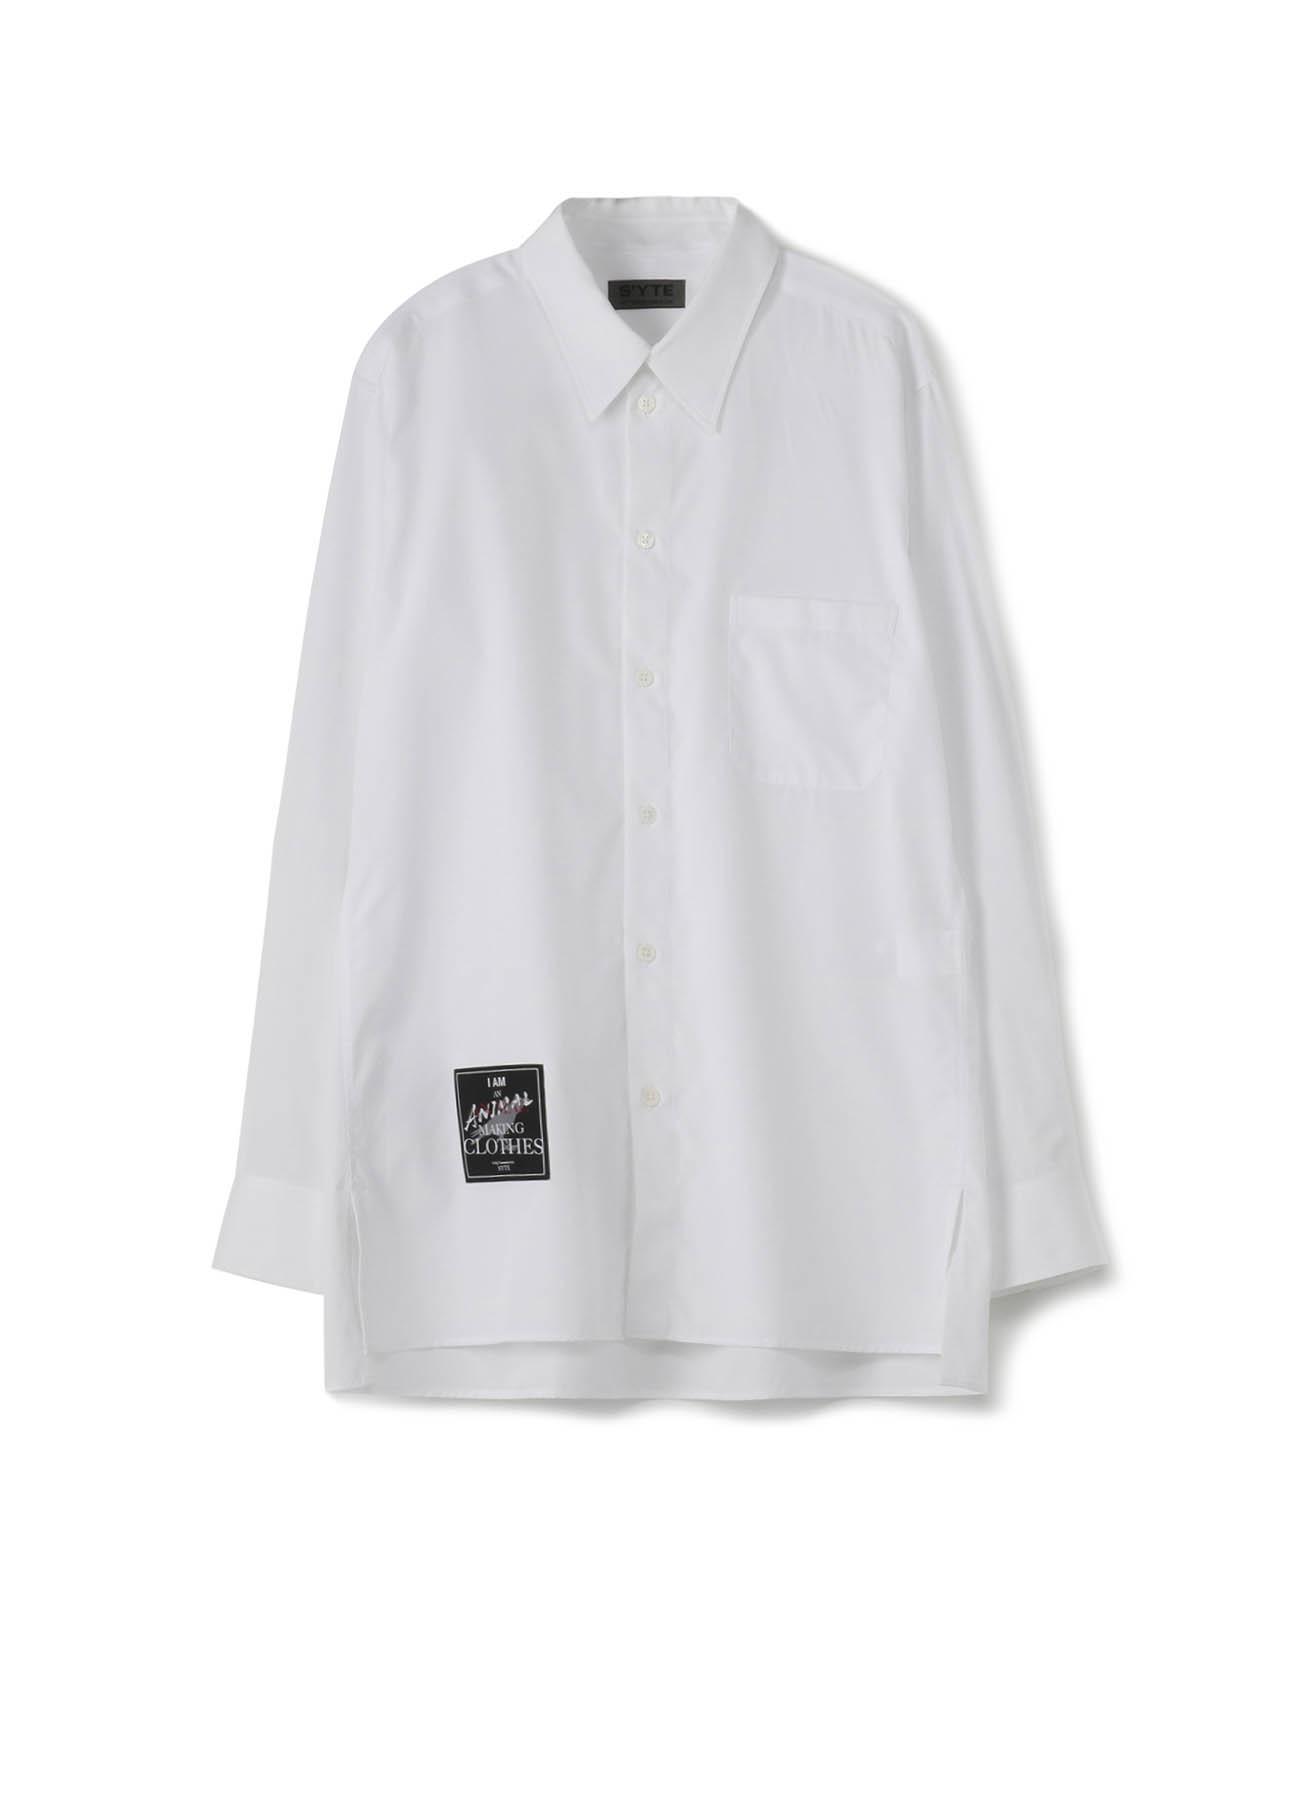 100/2 Broad 「I am an animal making clothes.」 Regular Collar Shirt